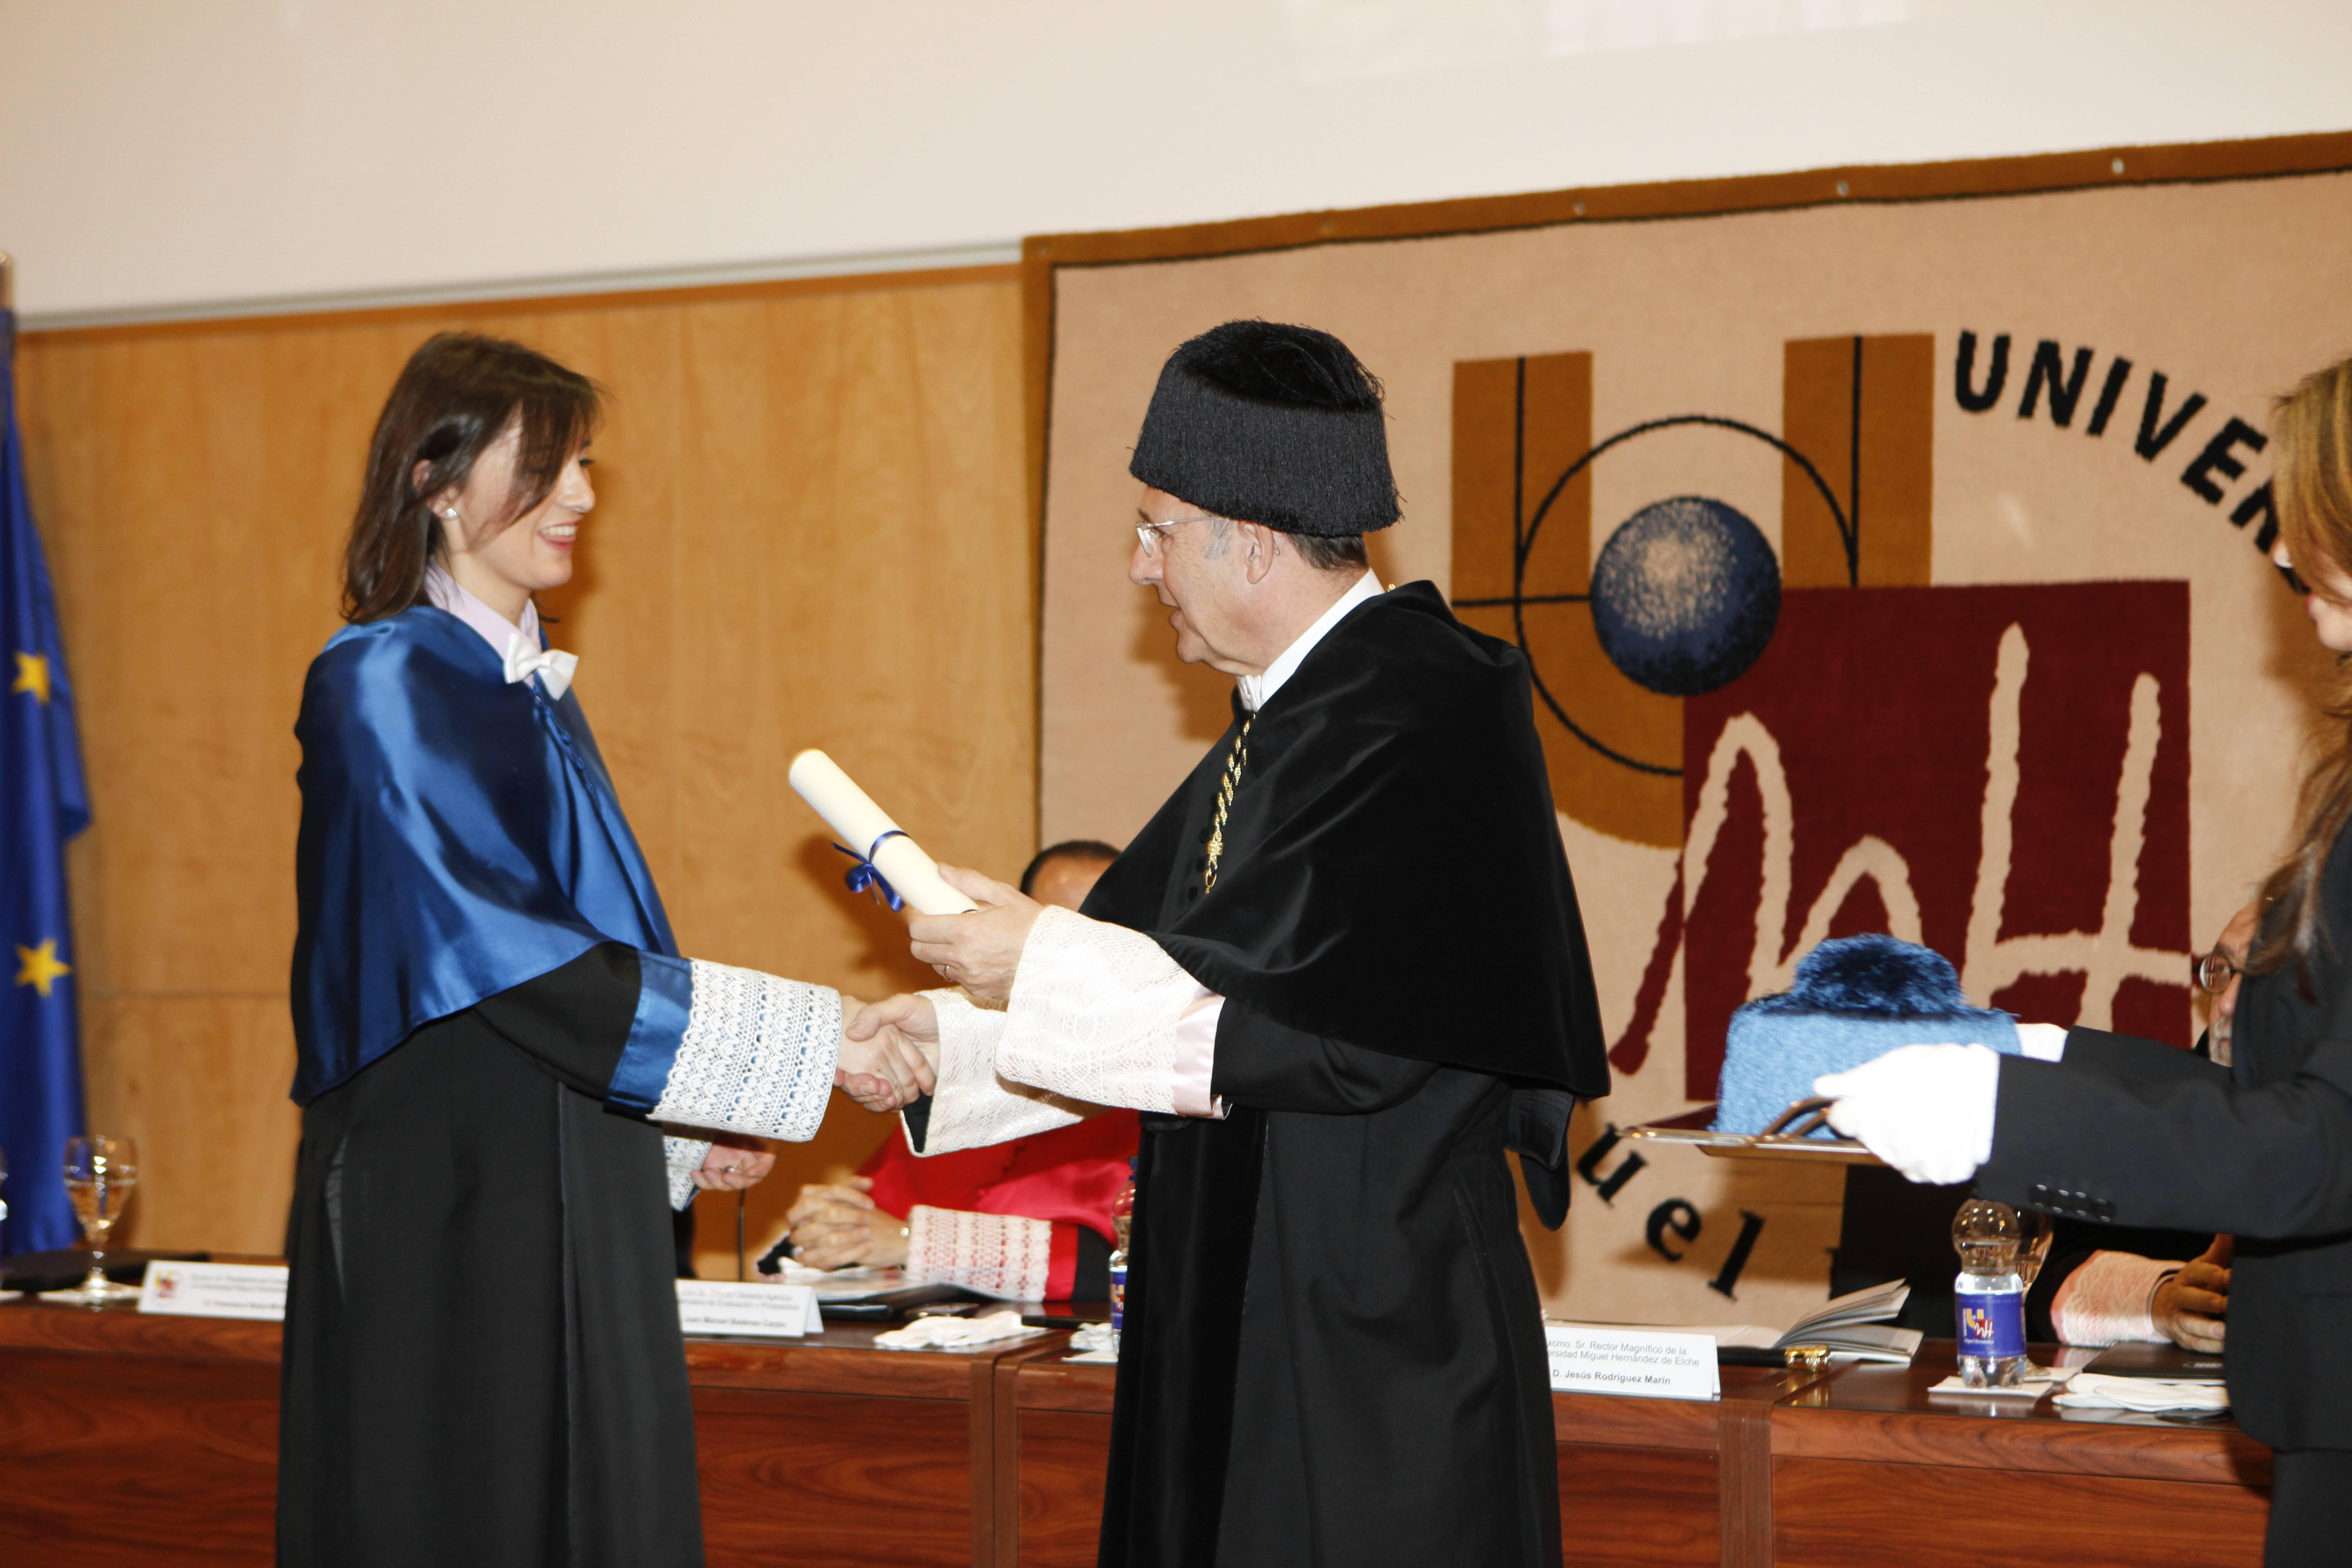 doctor-honoris-causa-luis-gamir_mg_1093.jpg